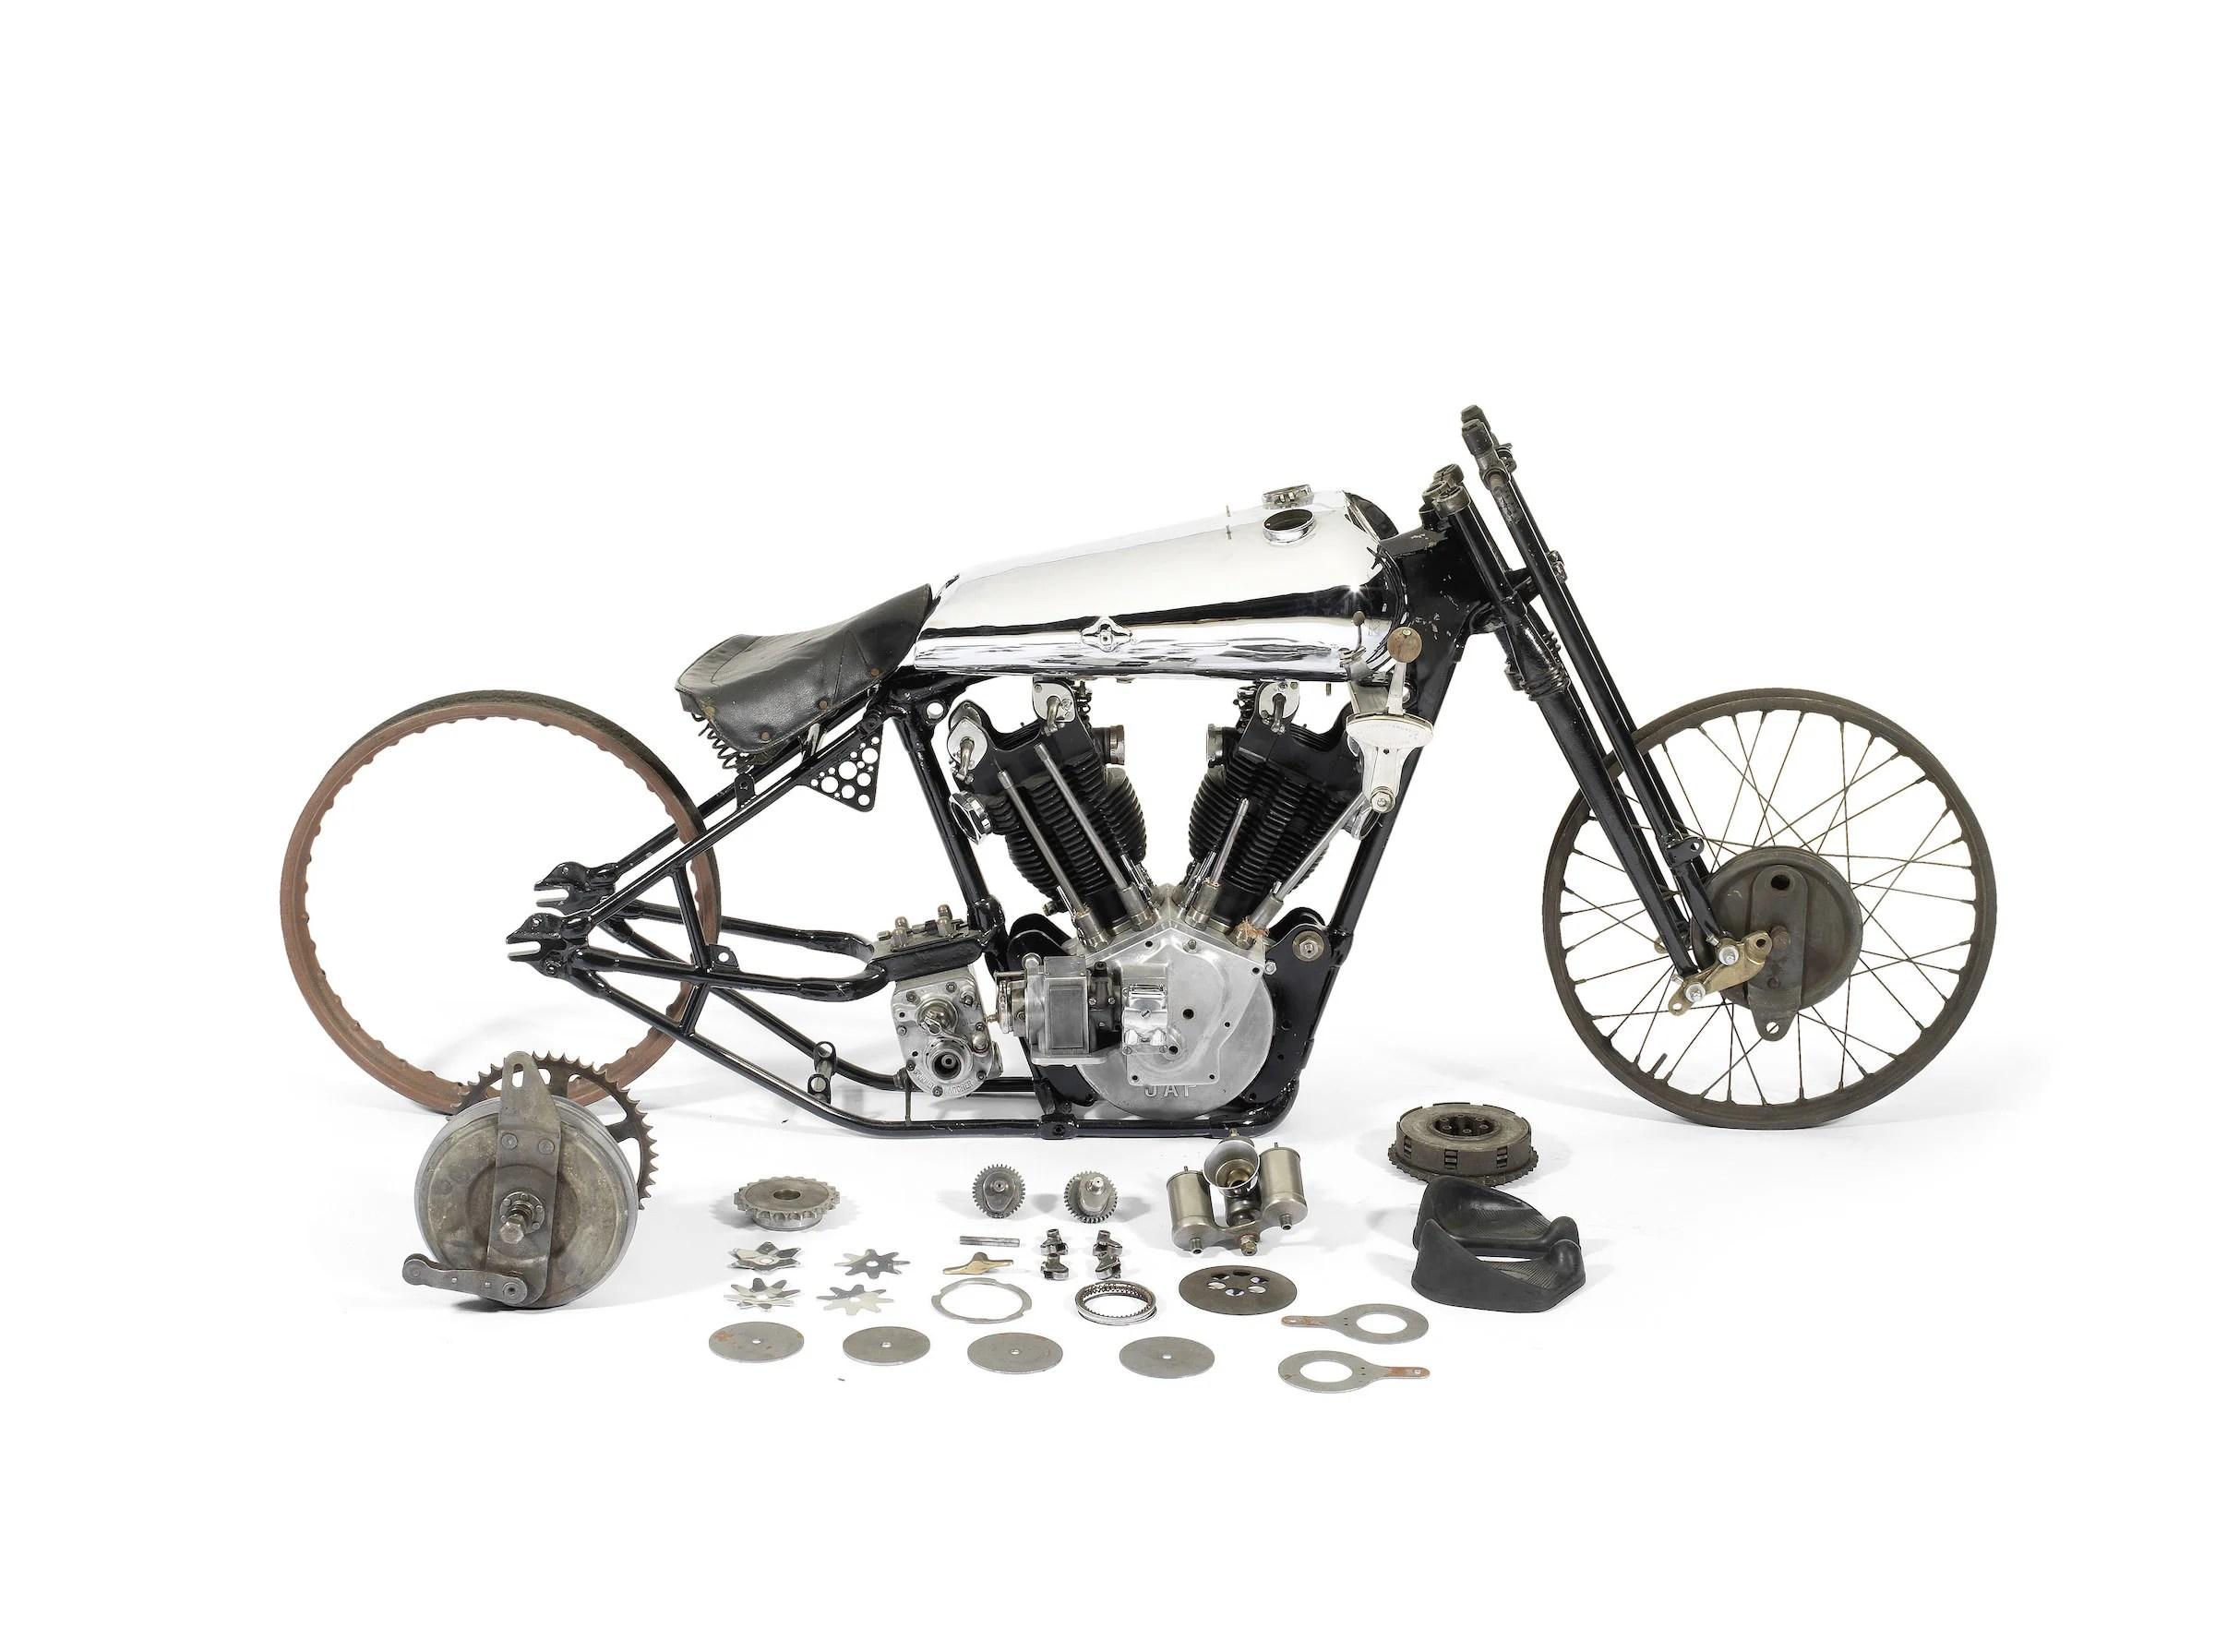 100 000 Project Bike Brough Superior Ss100 Pendine